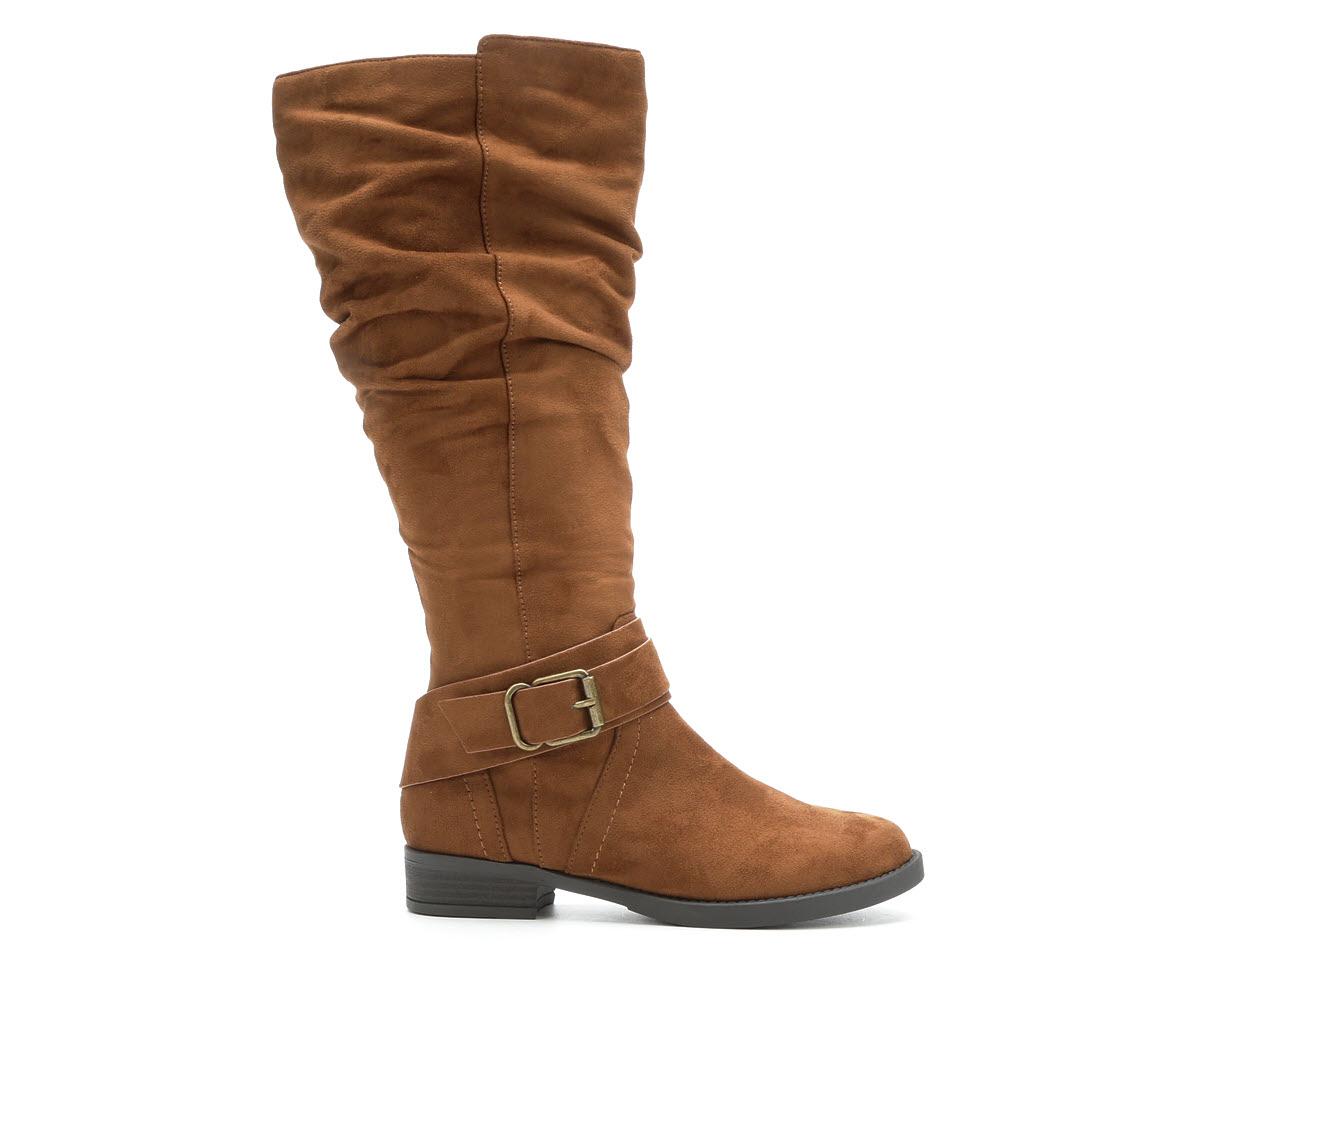 Unr8ed Darius Women's Boots (Brown - Canvas)